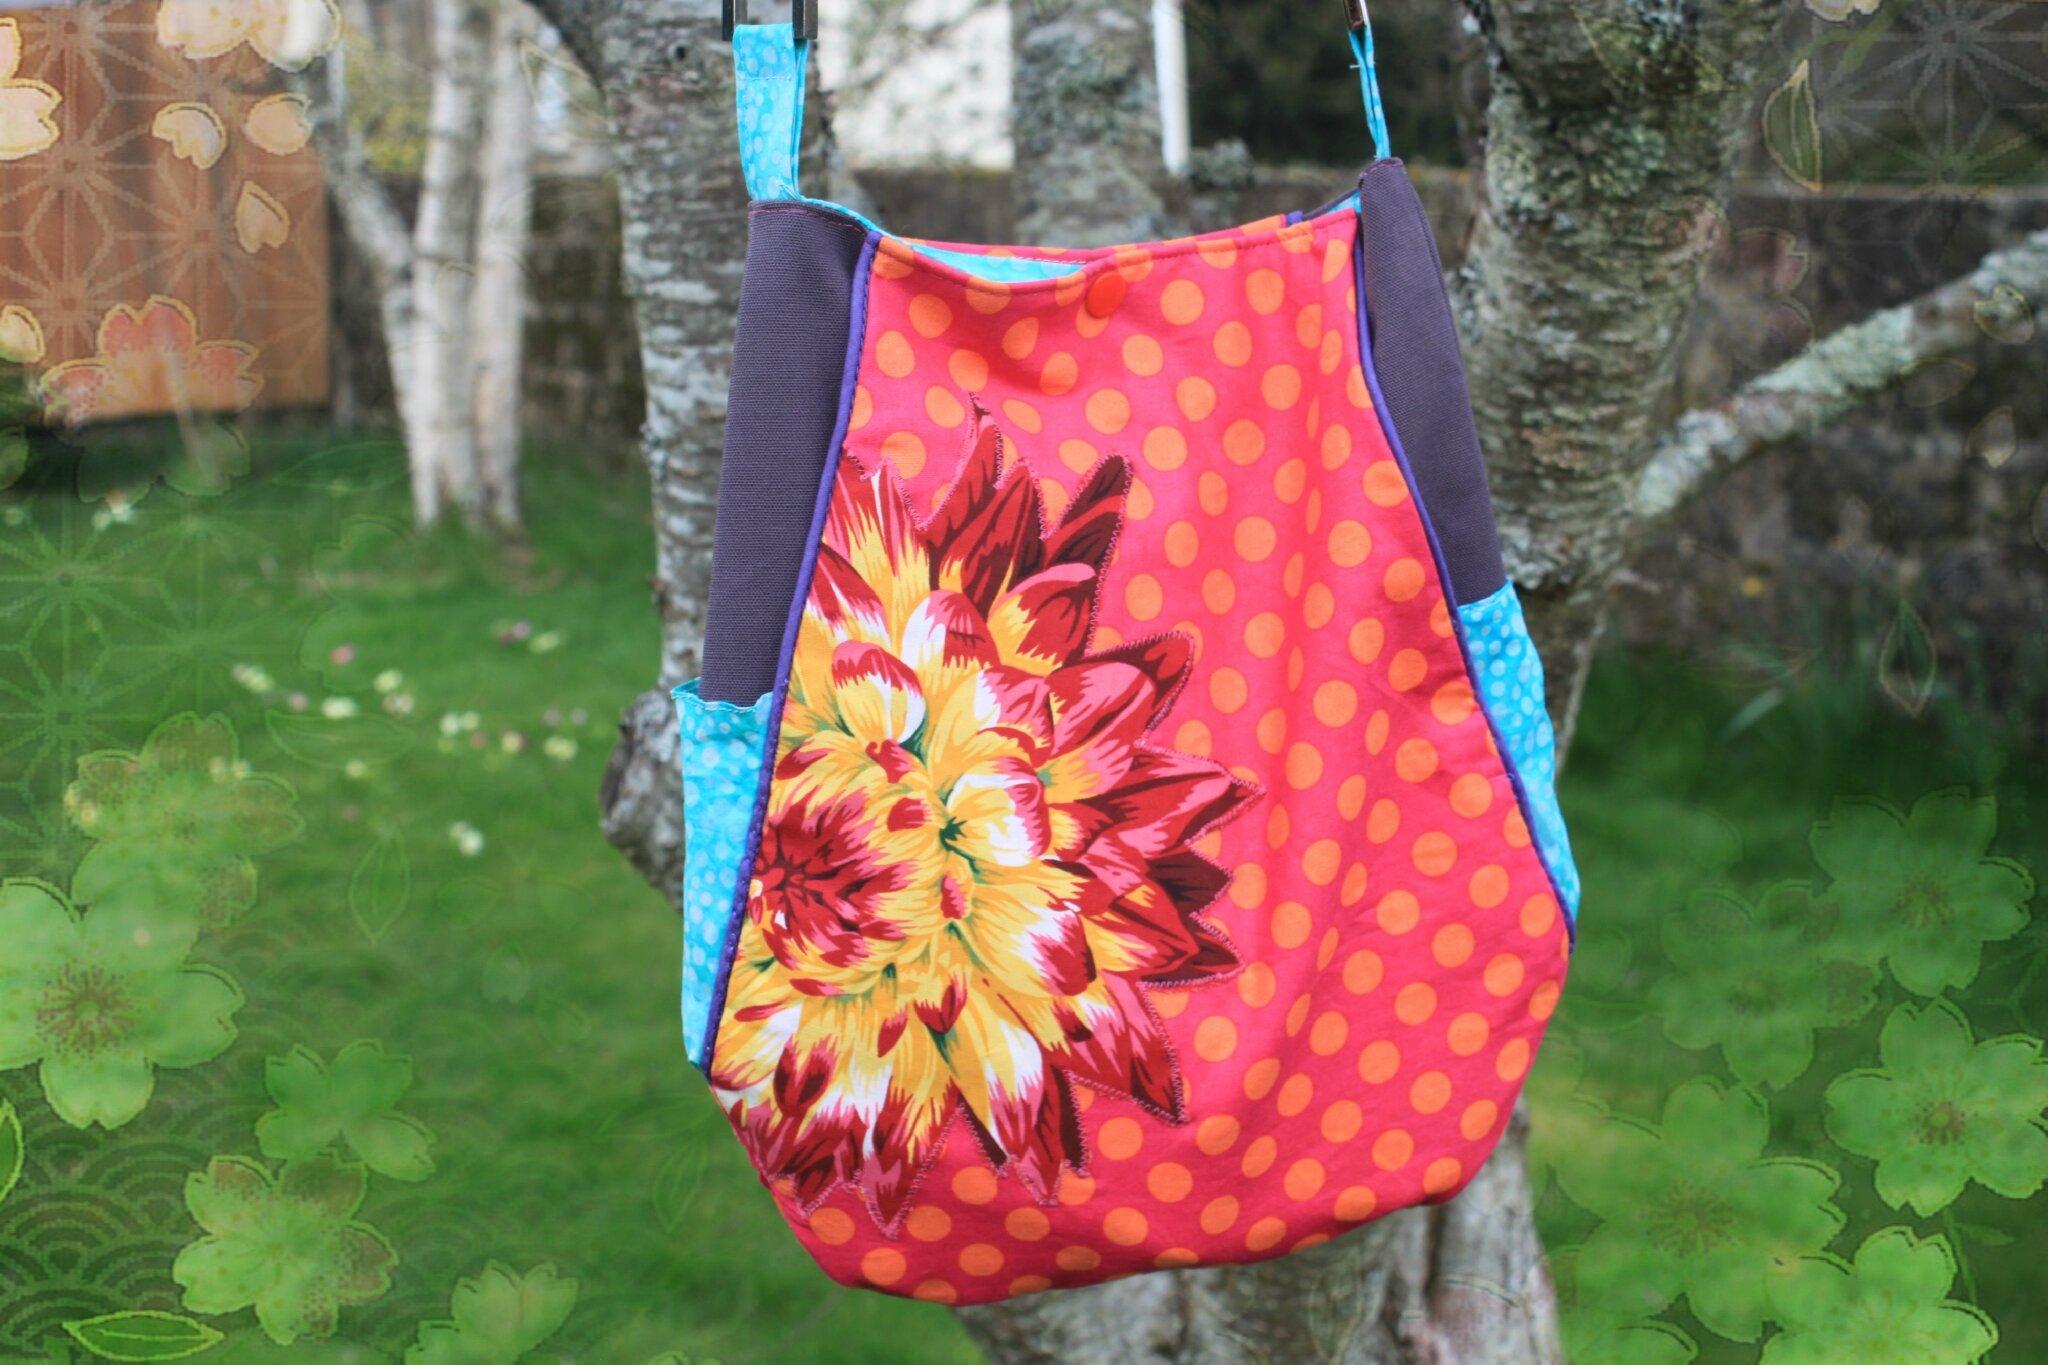 Mon sac de printemps {Concours Abracadacraft / Coudre et Broder/Linna Morata}